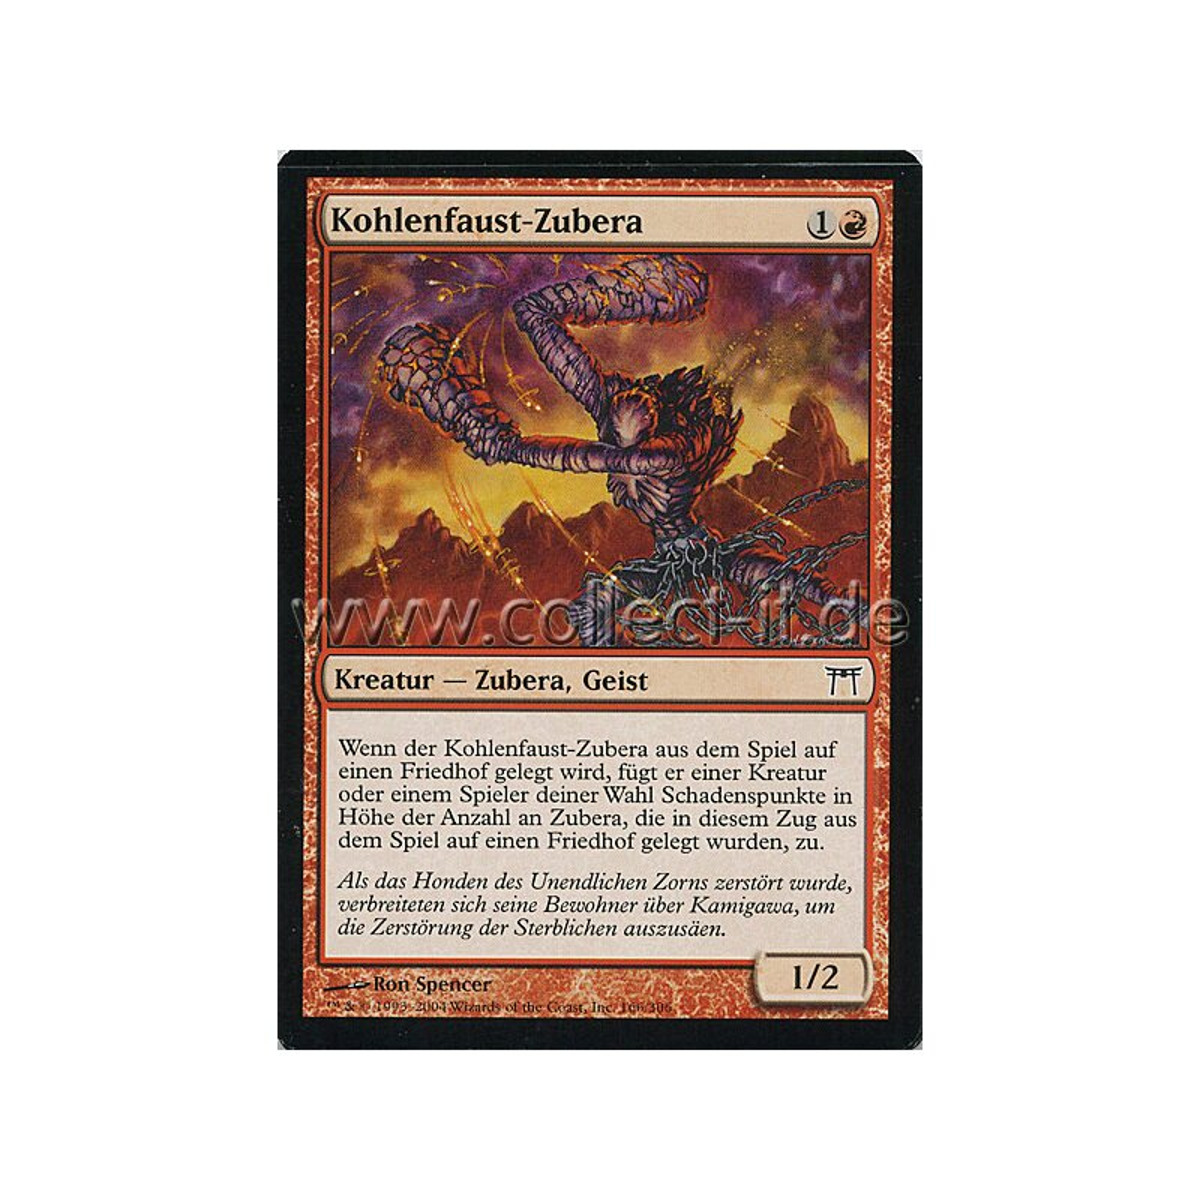 Magic MTG Meister von Kamigawa 166 Kohlenfaust-Zubera Trading Cards Non-Sport Trading Cards